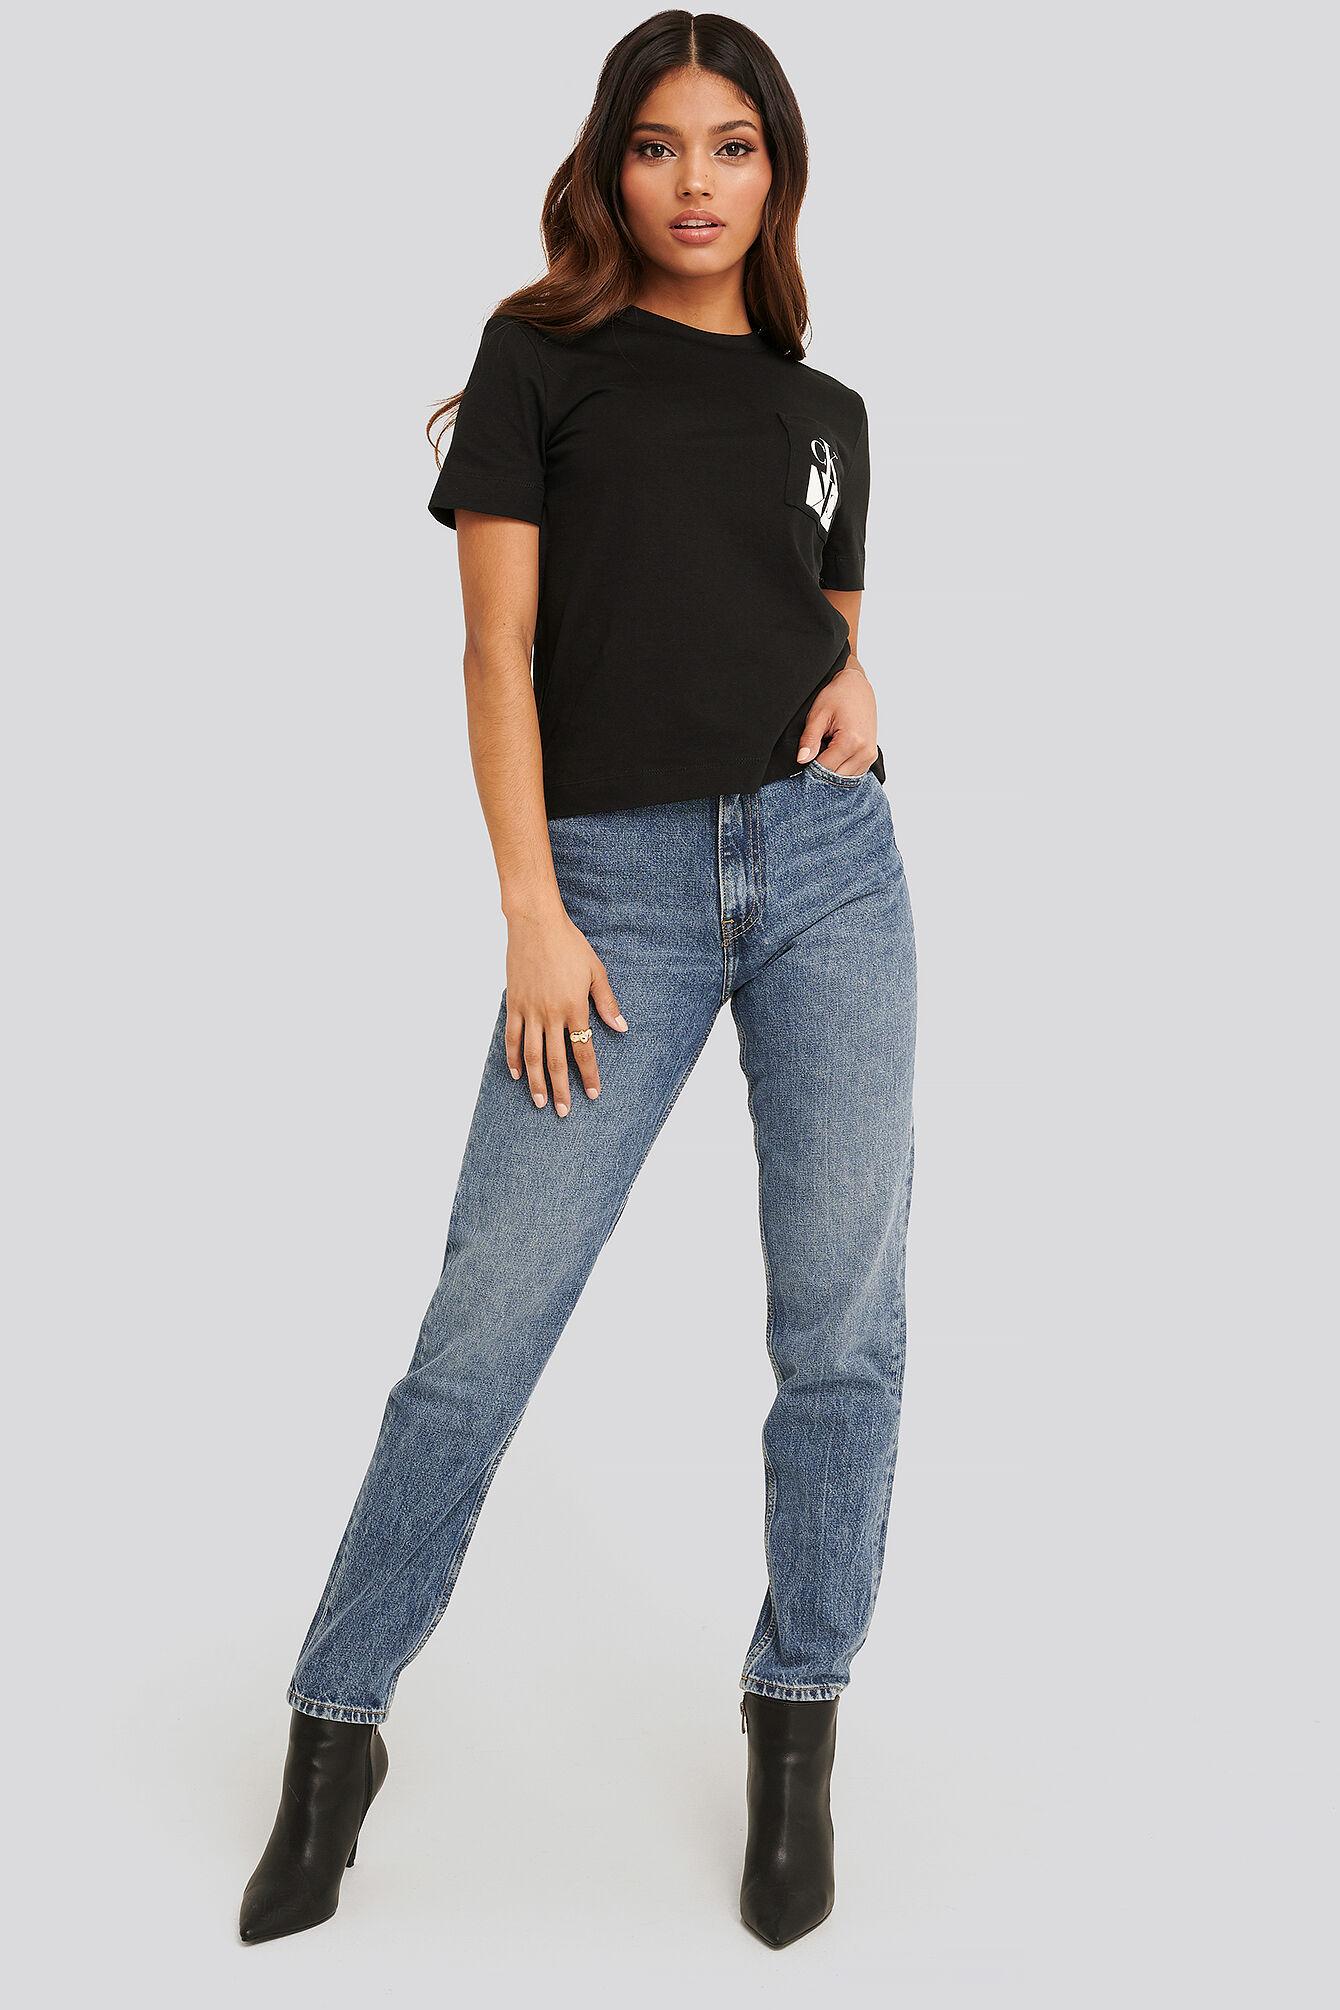 Calvin Klein Mom Jeans - Blue  - Size: W24,W25,W26,W27,W28,W29,W30